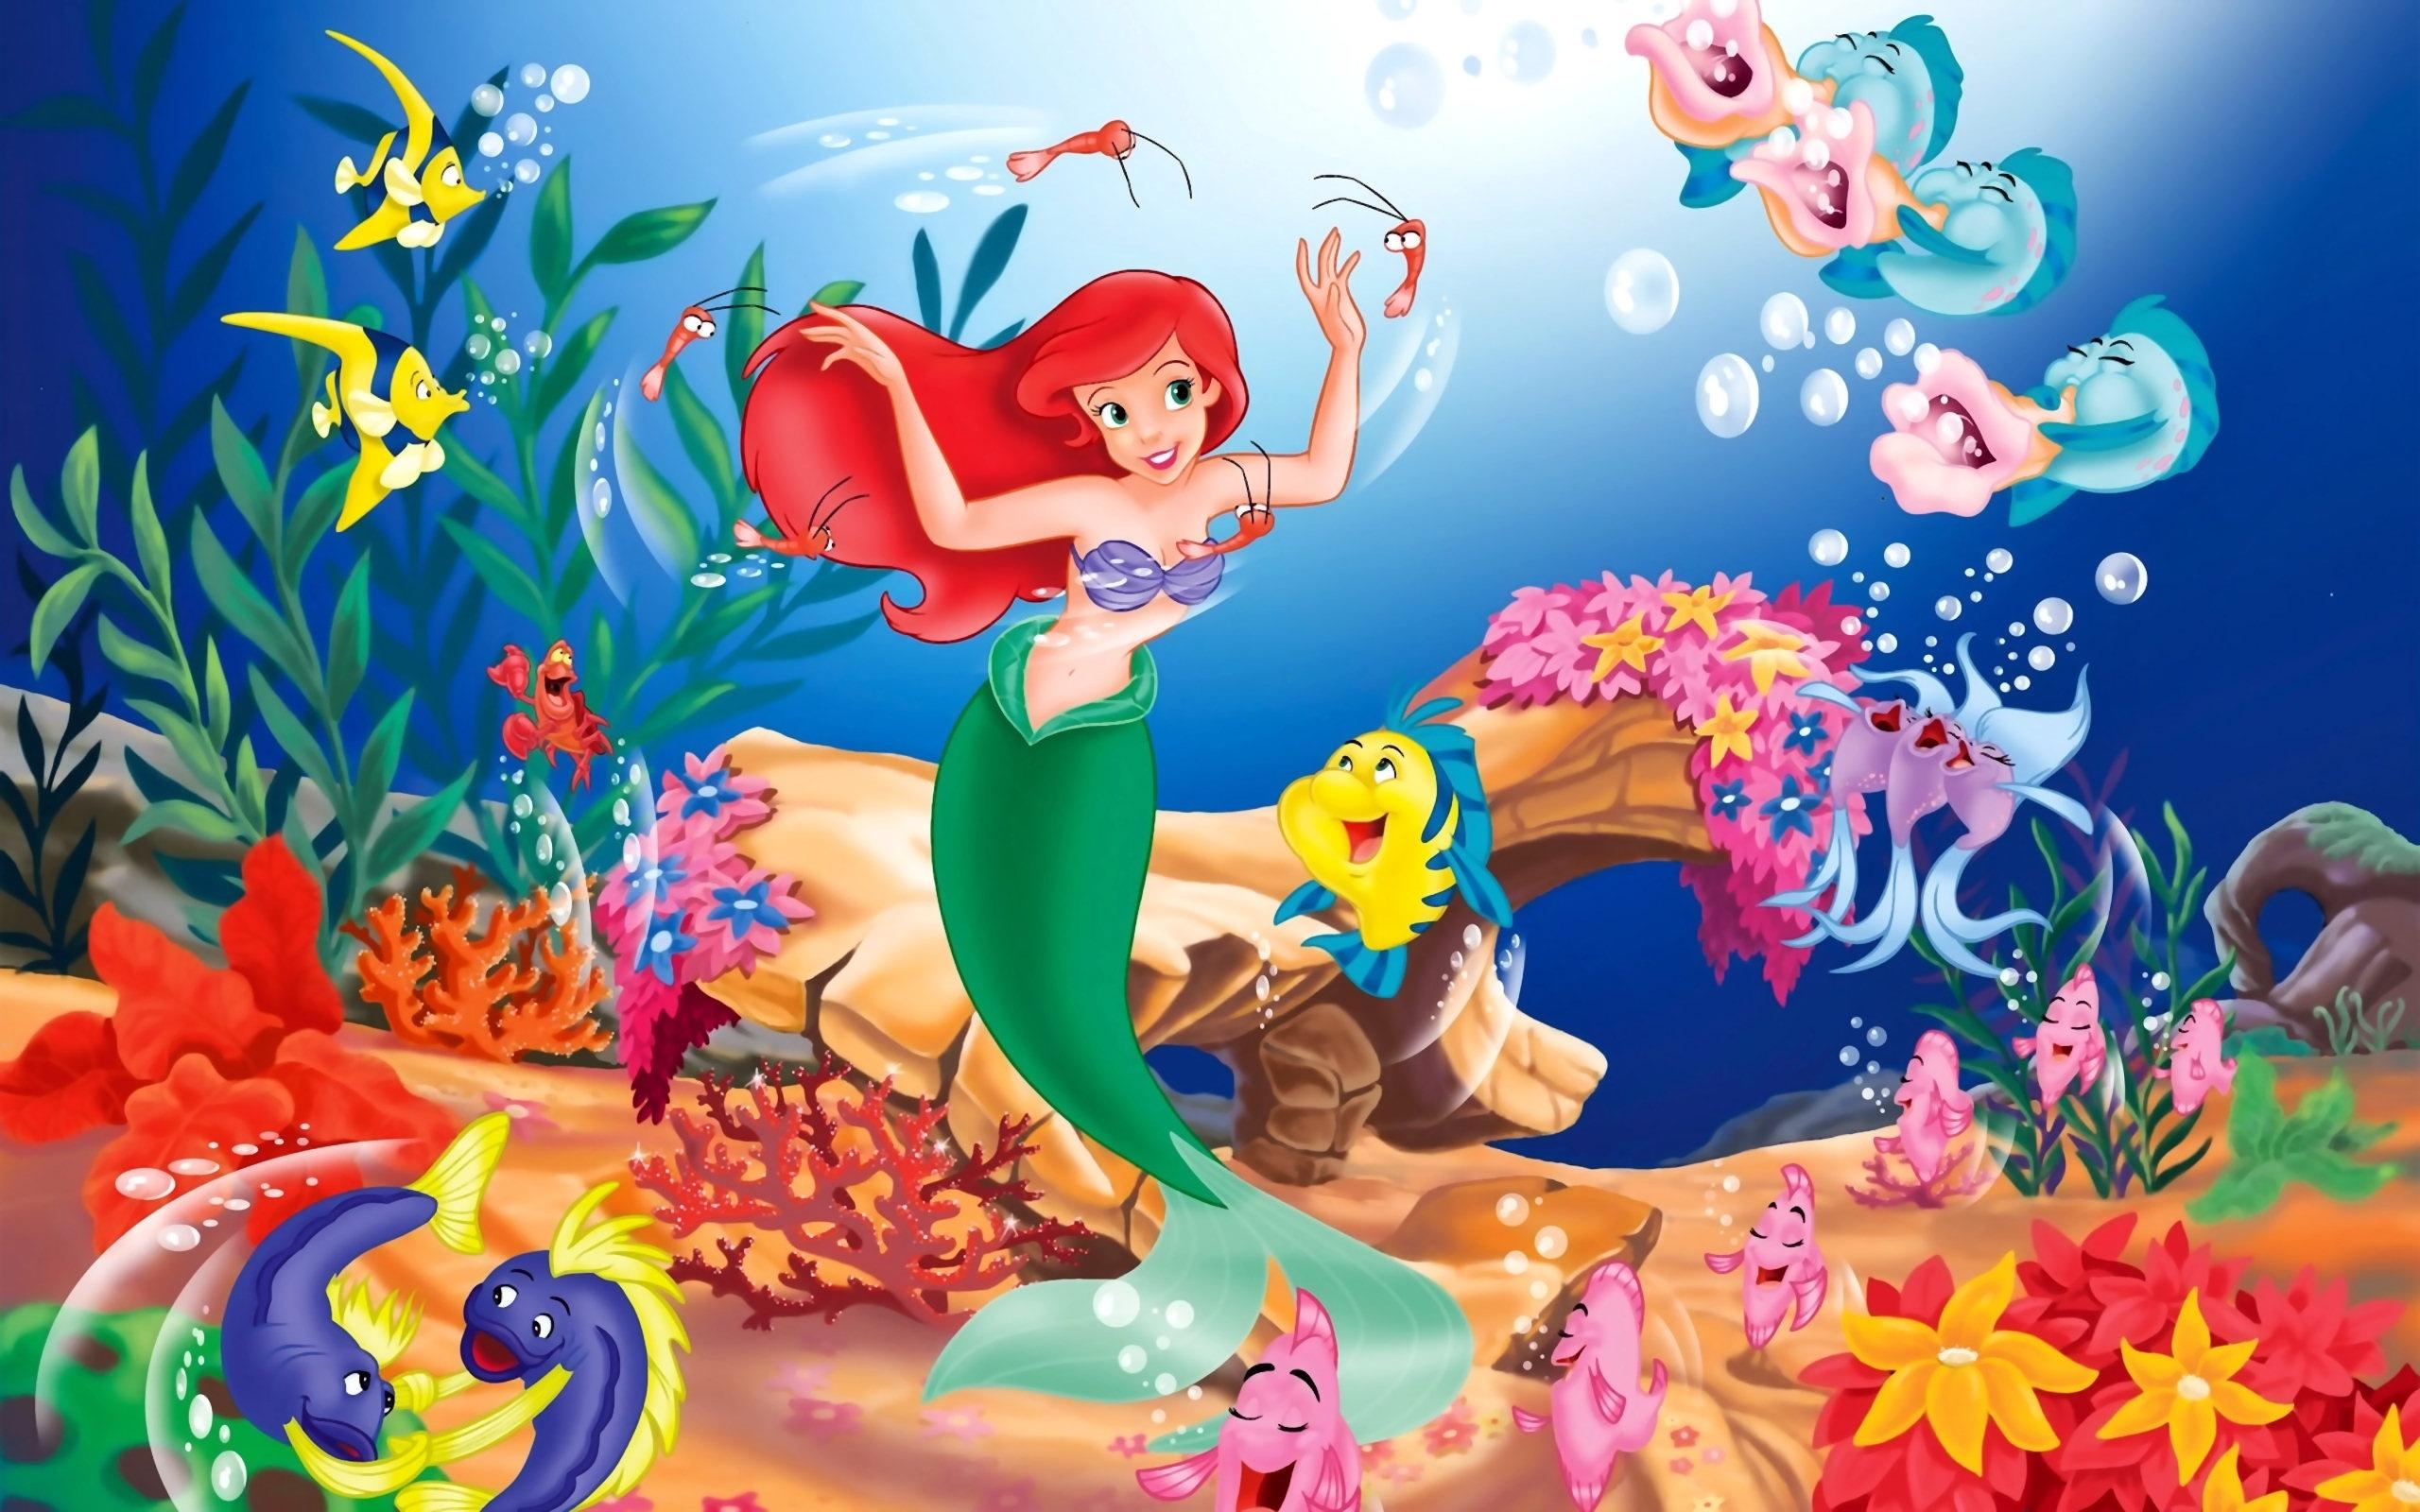 Cute Spongebob Cartoon Wallpaper Disney Wallpapers Hd Pixelstalk Net